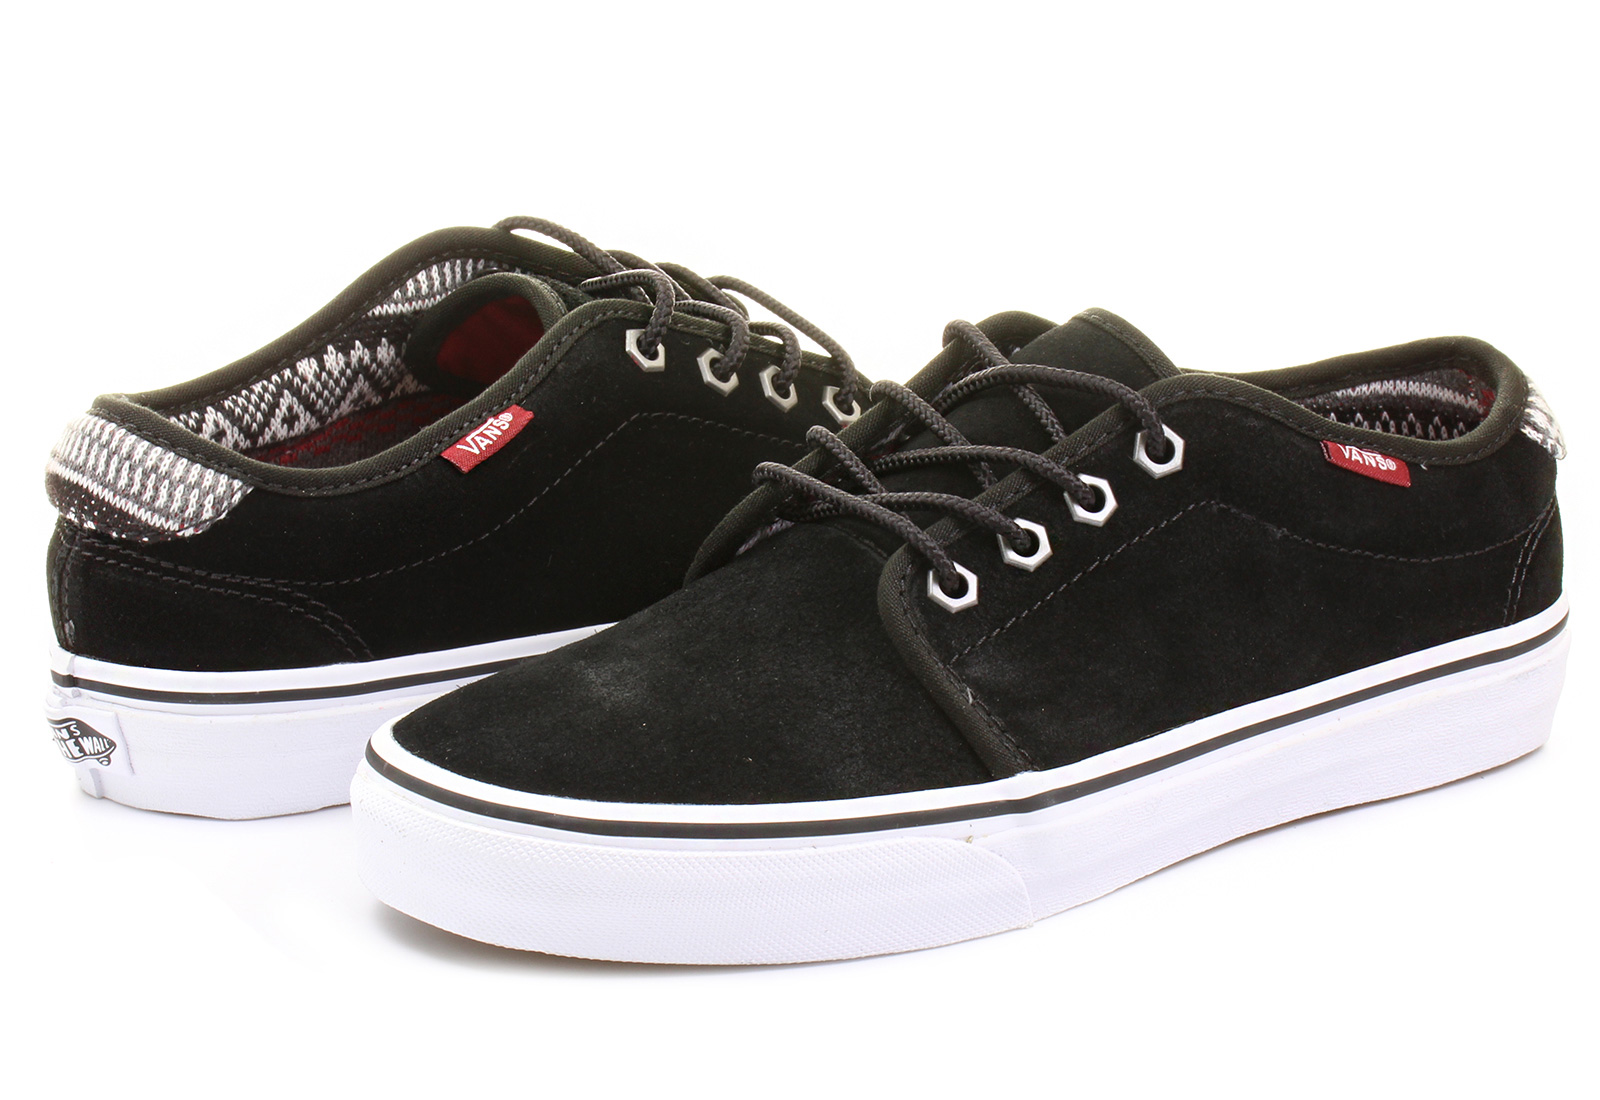 d669f71e3c Vans Sneakers - 159 Vulcanized - vrqn8q1 - Online shop for sneakers ...